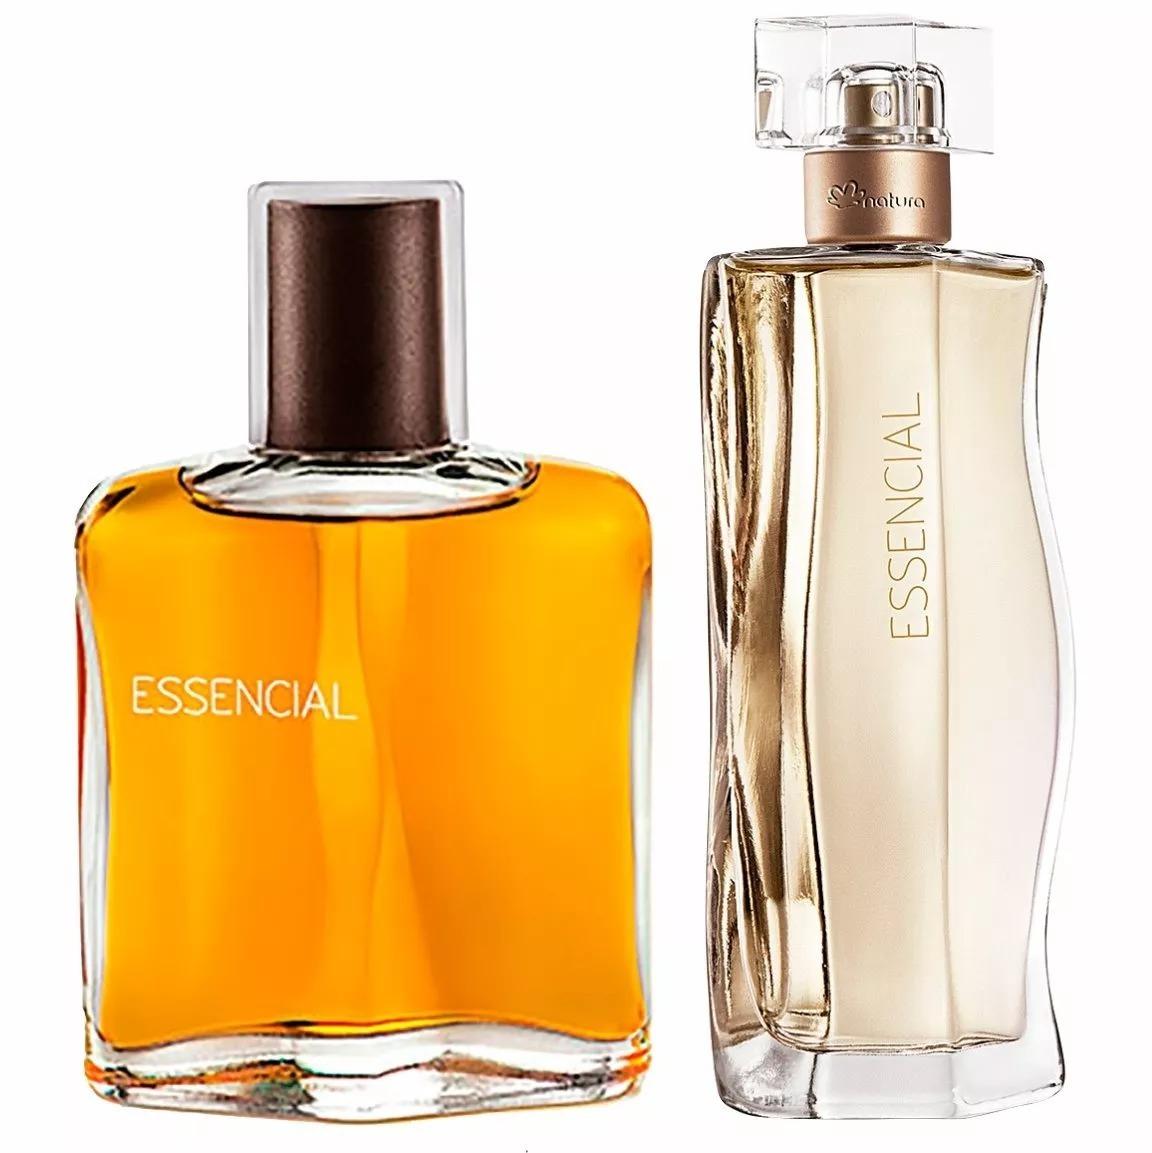 3766f0804f Kit Perfume Natura Essencial Masculino E Essencial Feminino - R  216 ...